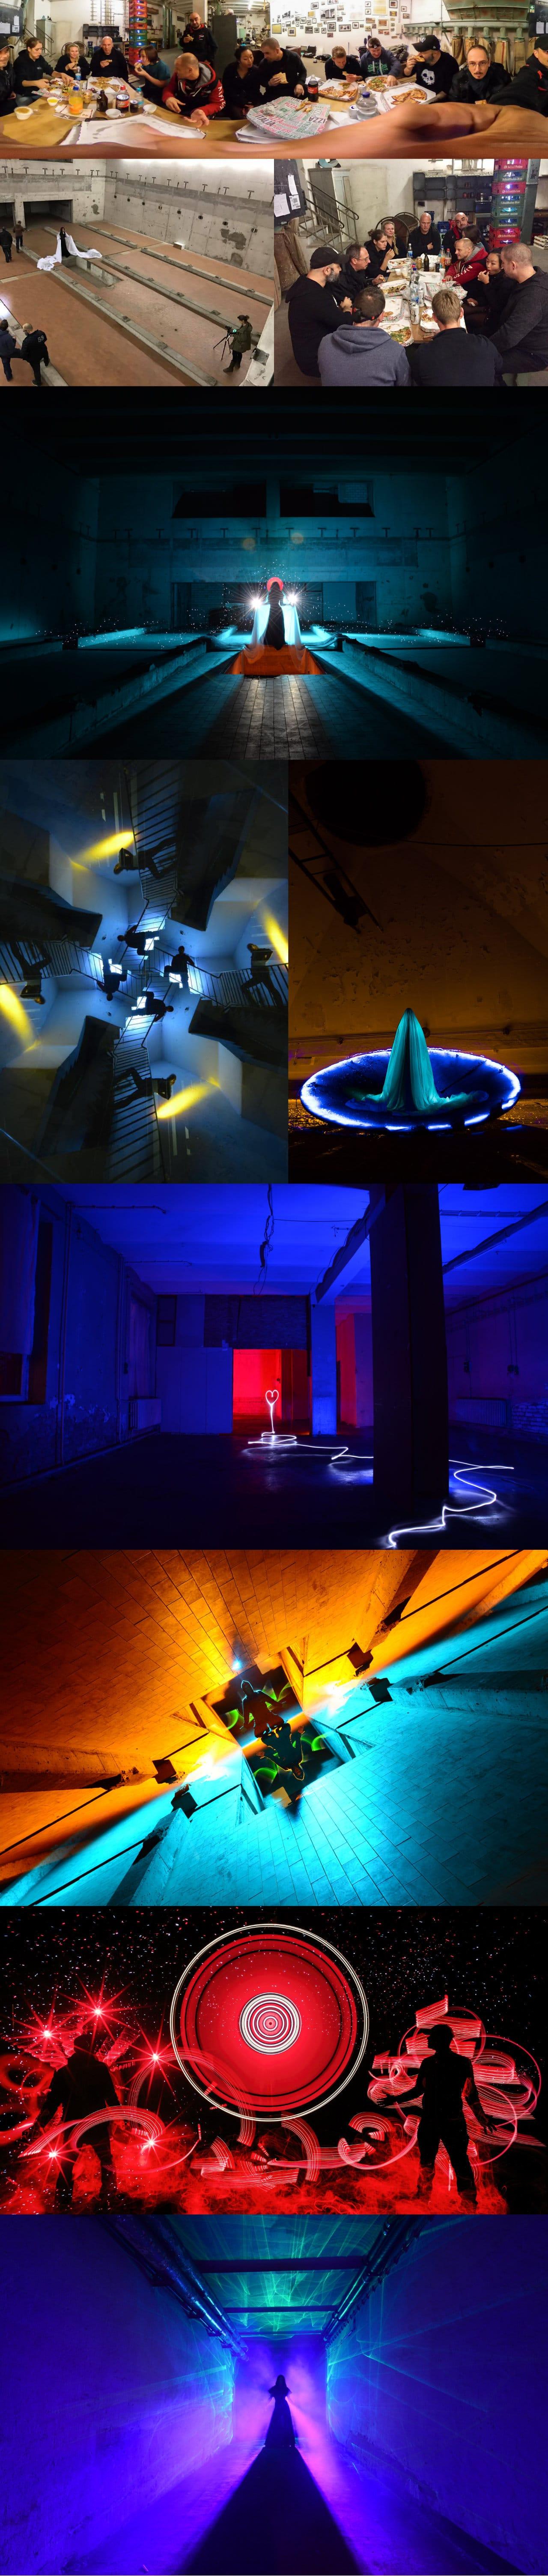 lightpainters-united-malzfabrik-day2